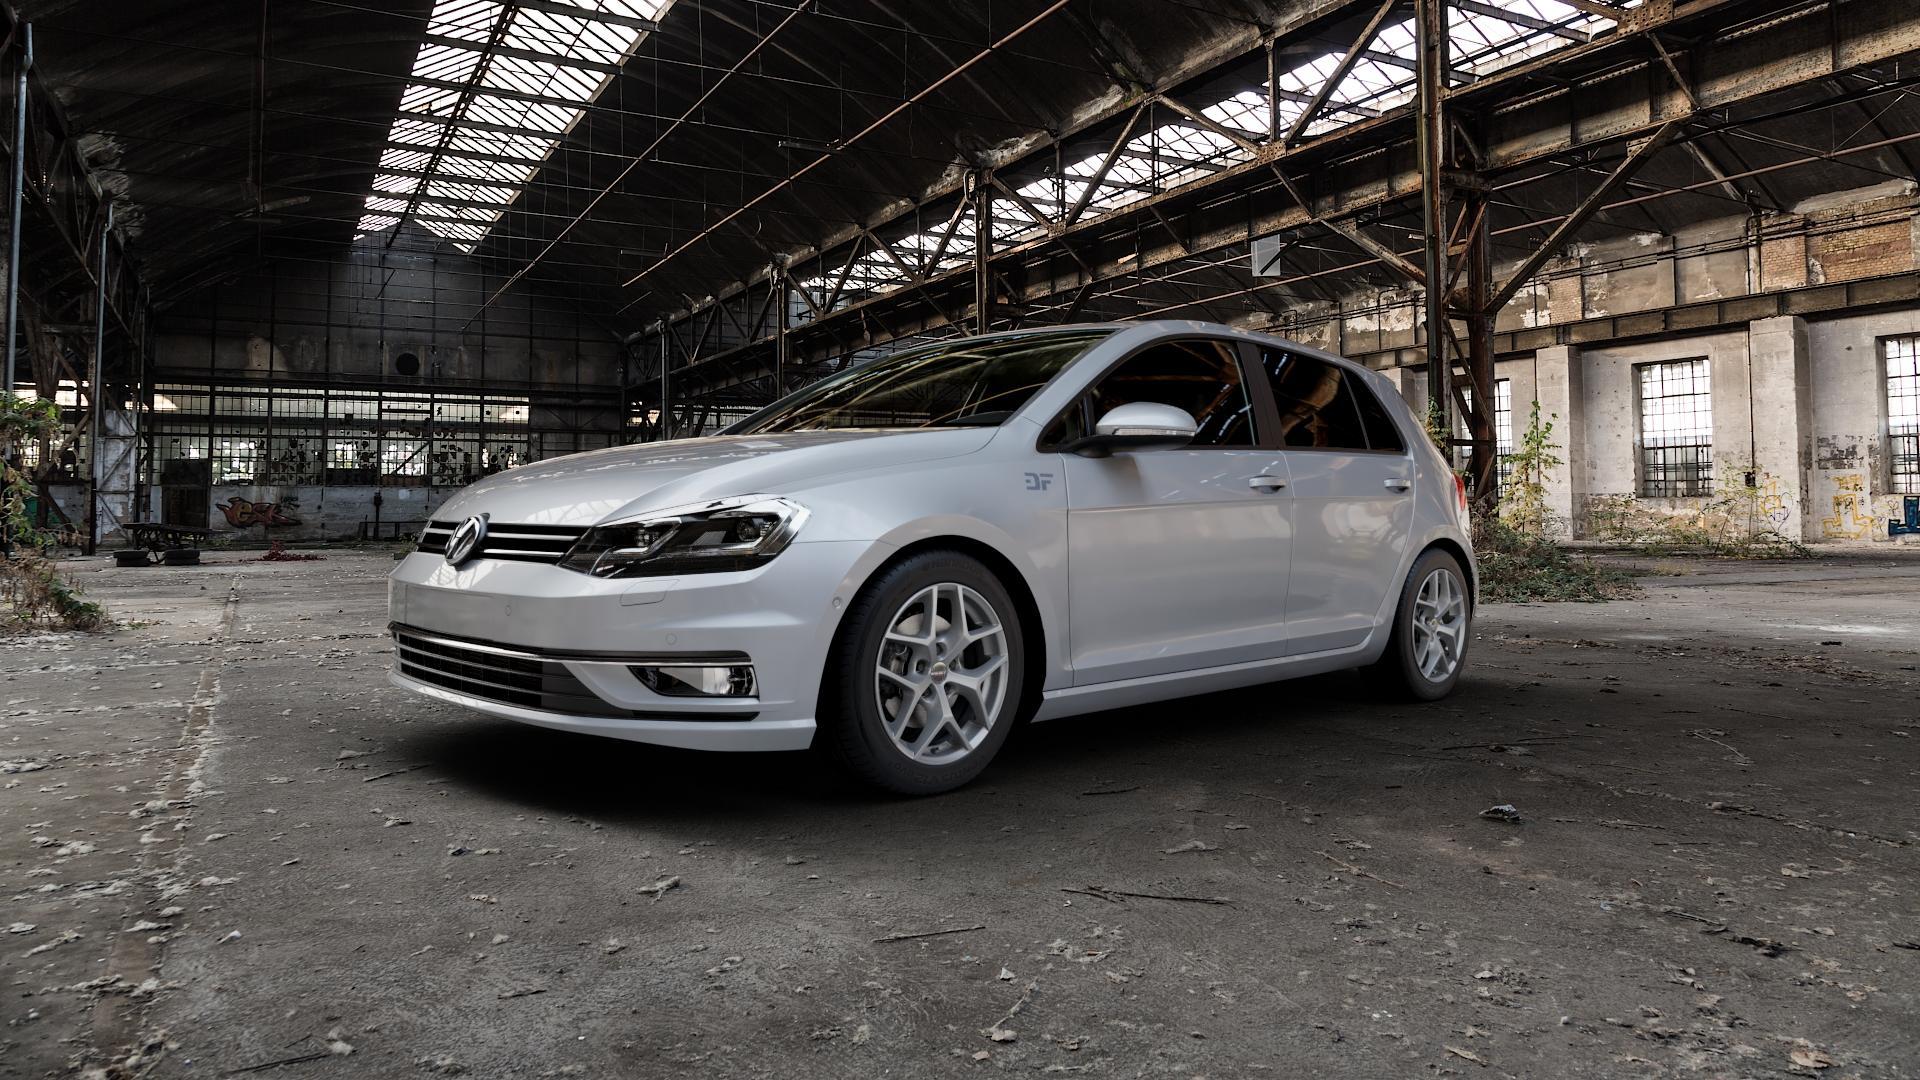 Borbet Y titan matt Felge mit Reifen grau in 16Zoll Winterfelge Alufelge auf silbernem Volkswagen (VW) Golf 7 Facelift 1,0l TSI 63kW (86 PS) 2,0l TDI 110kW (150 1,6l 66kW (90 1,4l 92kW (125 EcoFuel 85kW (116 81kW (110 TGI 4Motion 1,5l 96kW (131 ⬇️ mit 15mm Tieferlegung ⬇️ Industriehalle 1 Camera_000